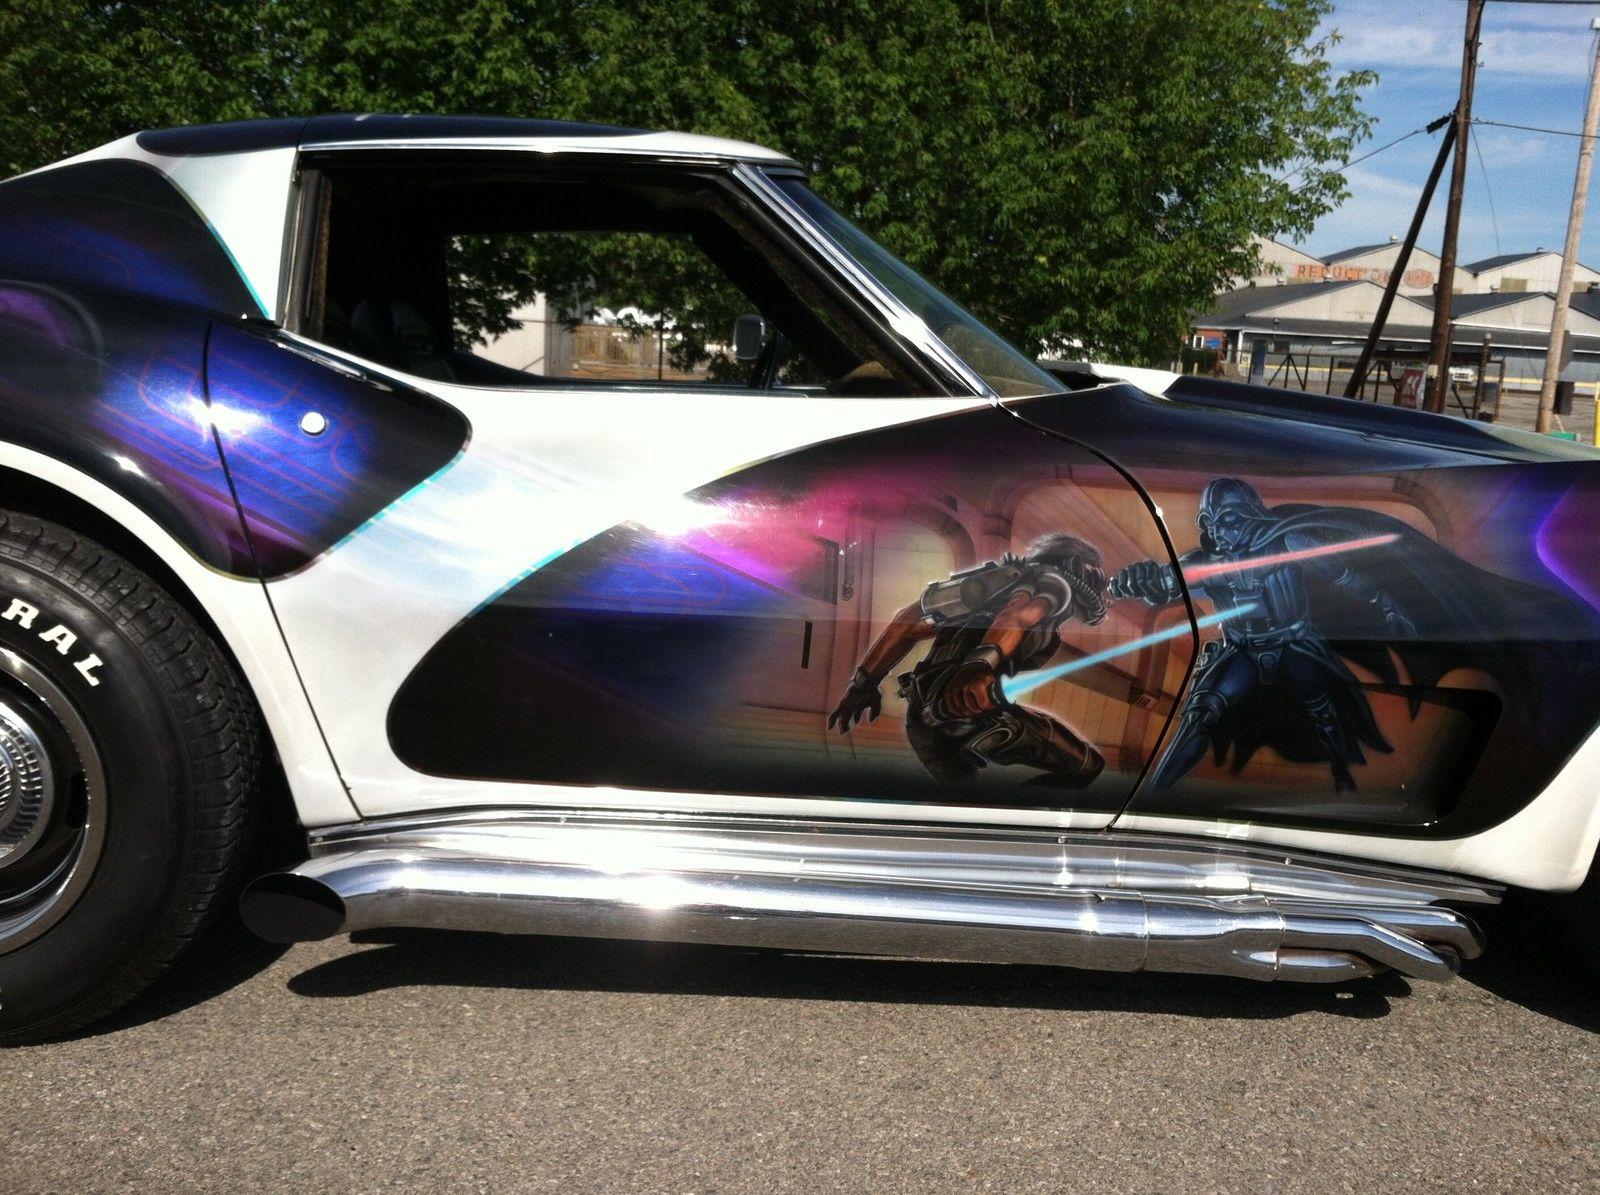 This 1974 Chevrolet Corvette Star Wars Sold For 10 300 On